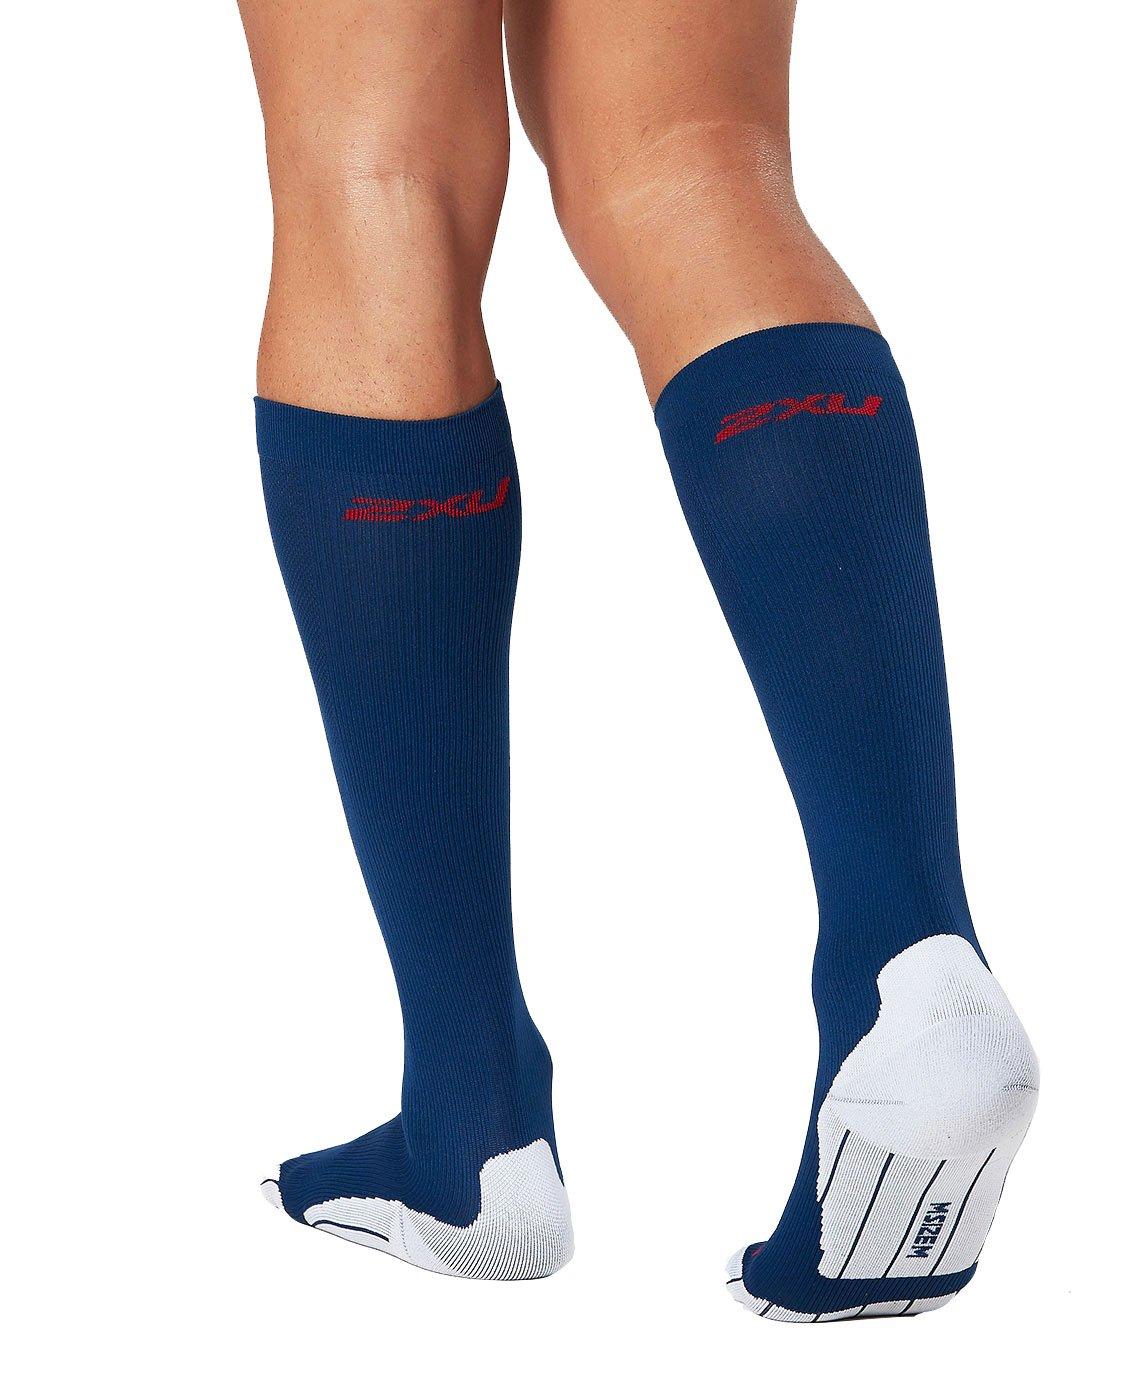 2XU Men's Compression Performance Run Socks, Navy/Red, X-Small by 2XU (Image #2)